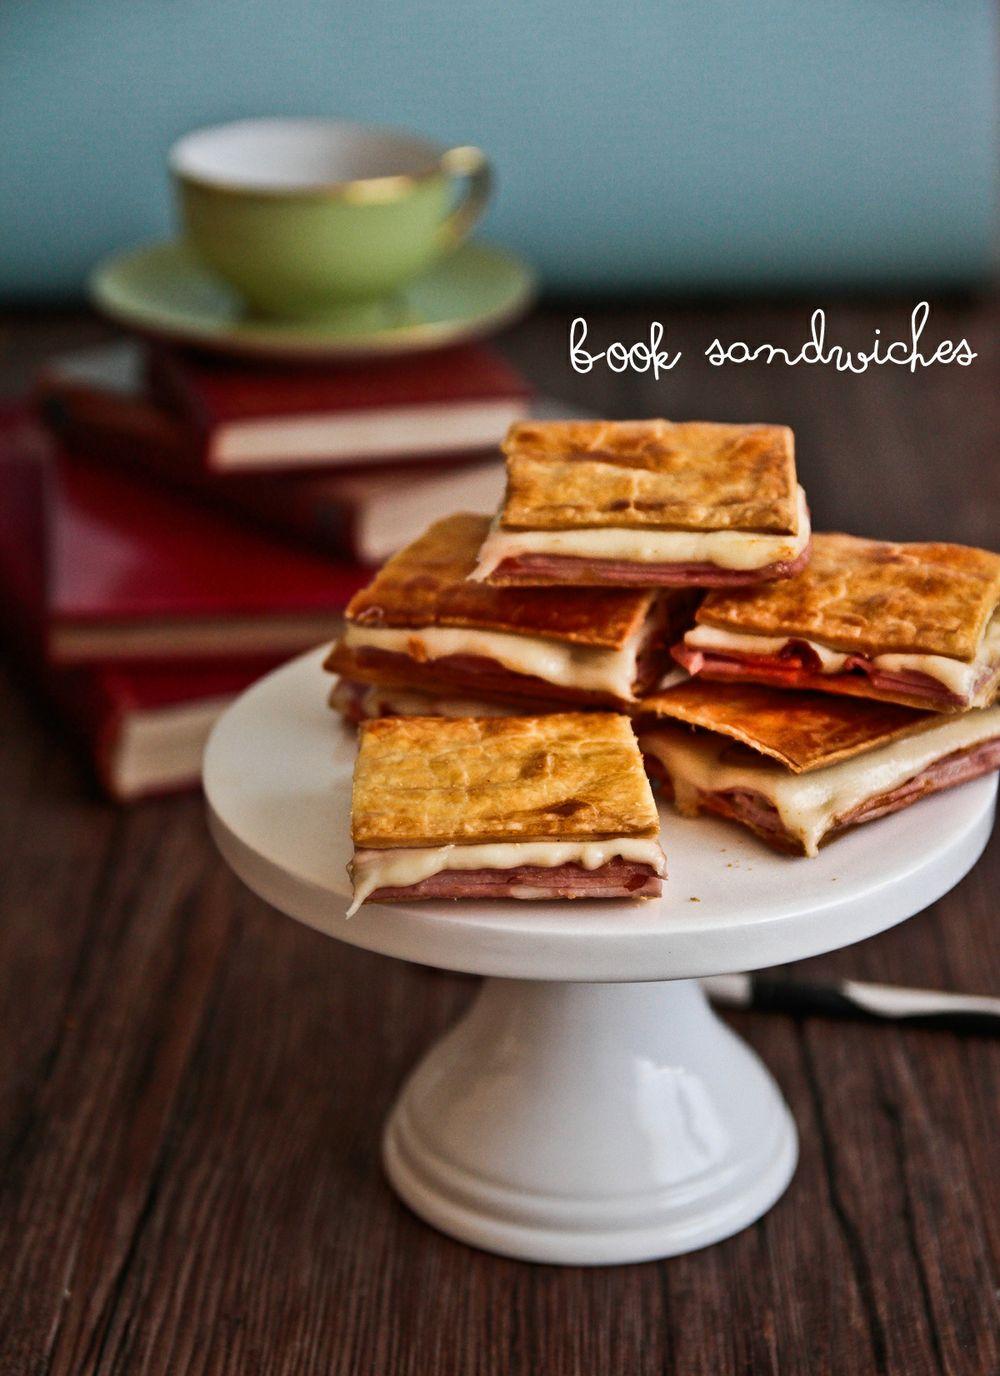 m-book-sandwiches-1-3